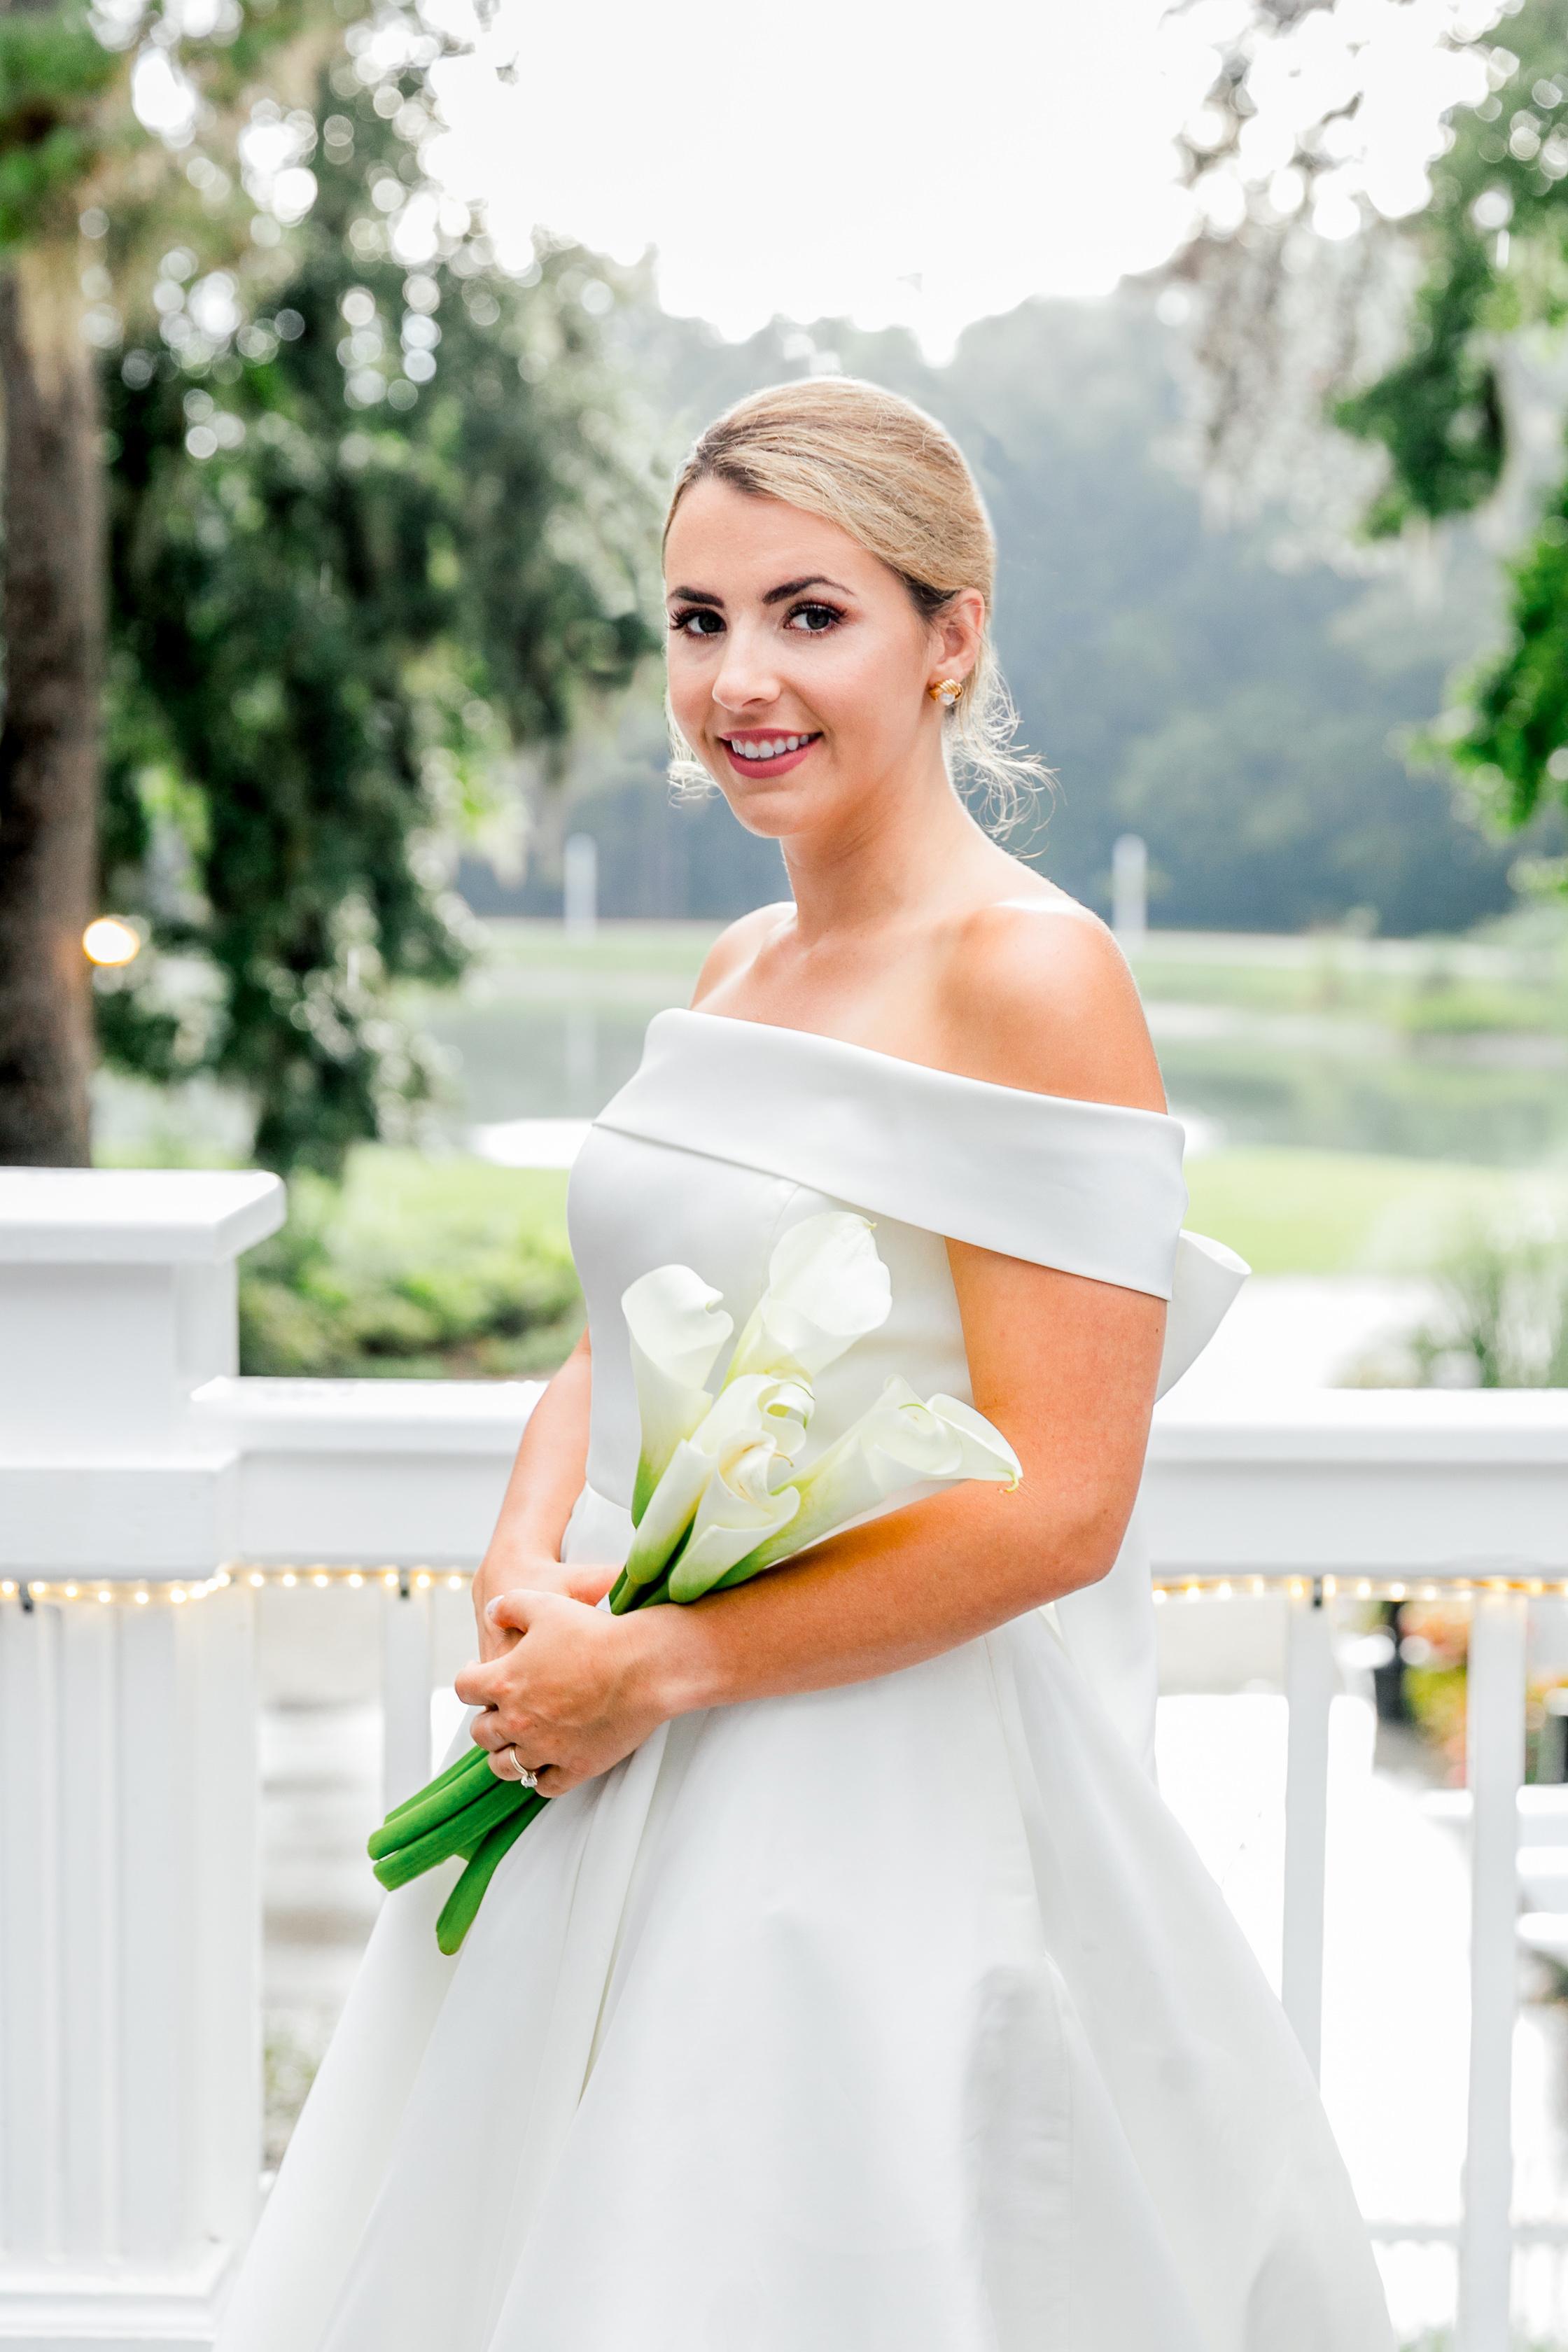 Edgemon Wedding 10733.jpg